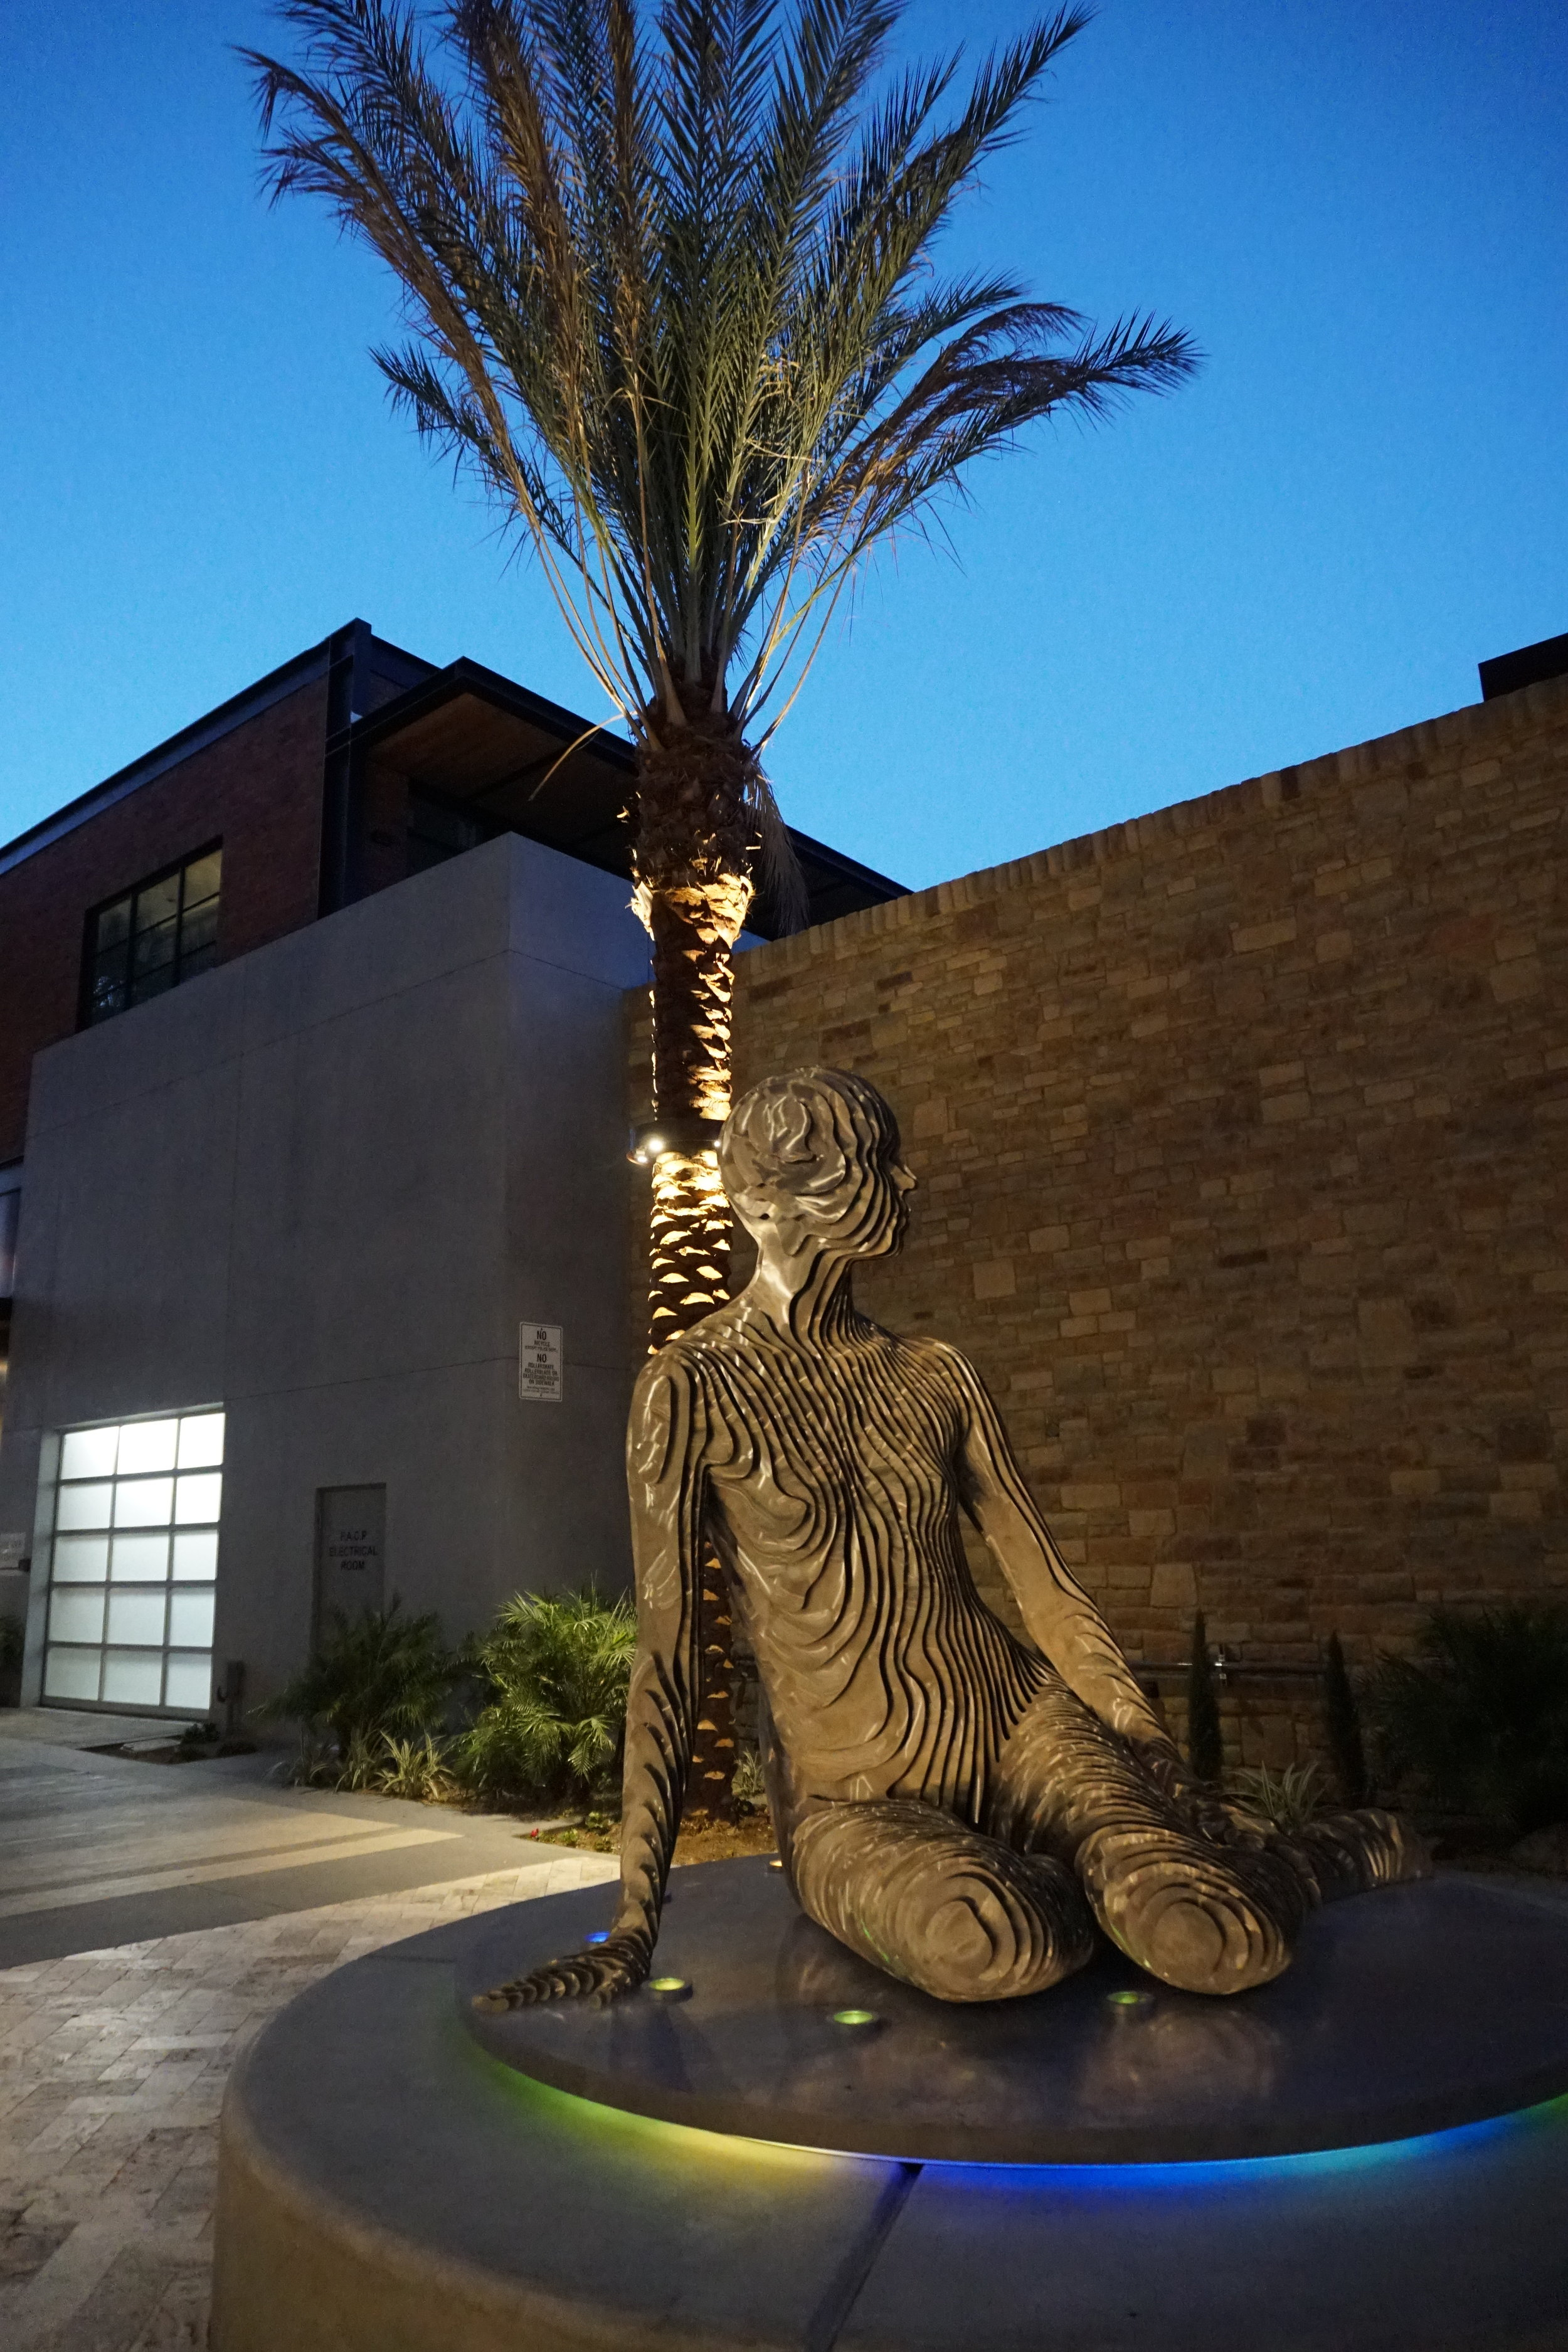 sculpture palm springs